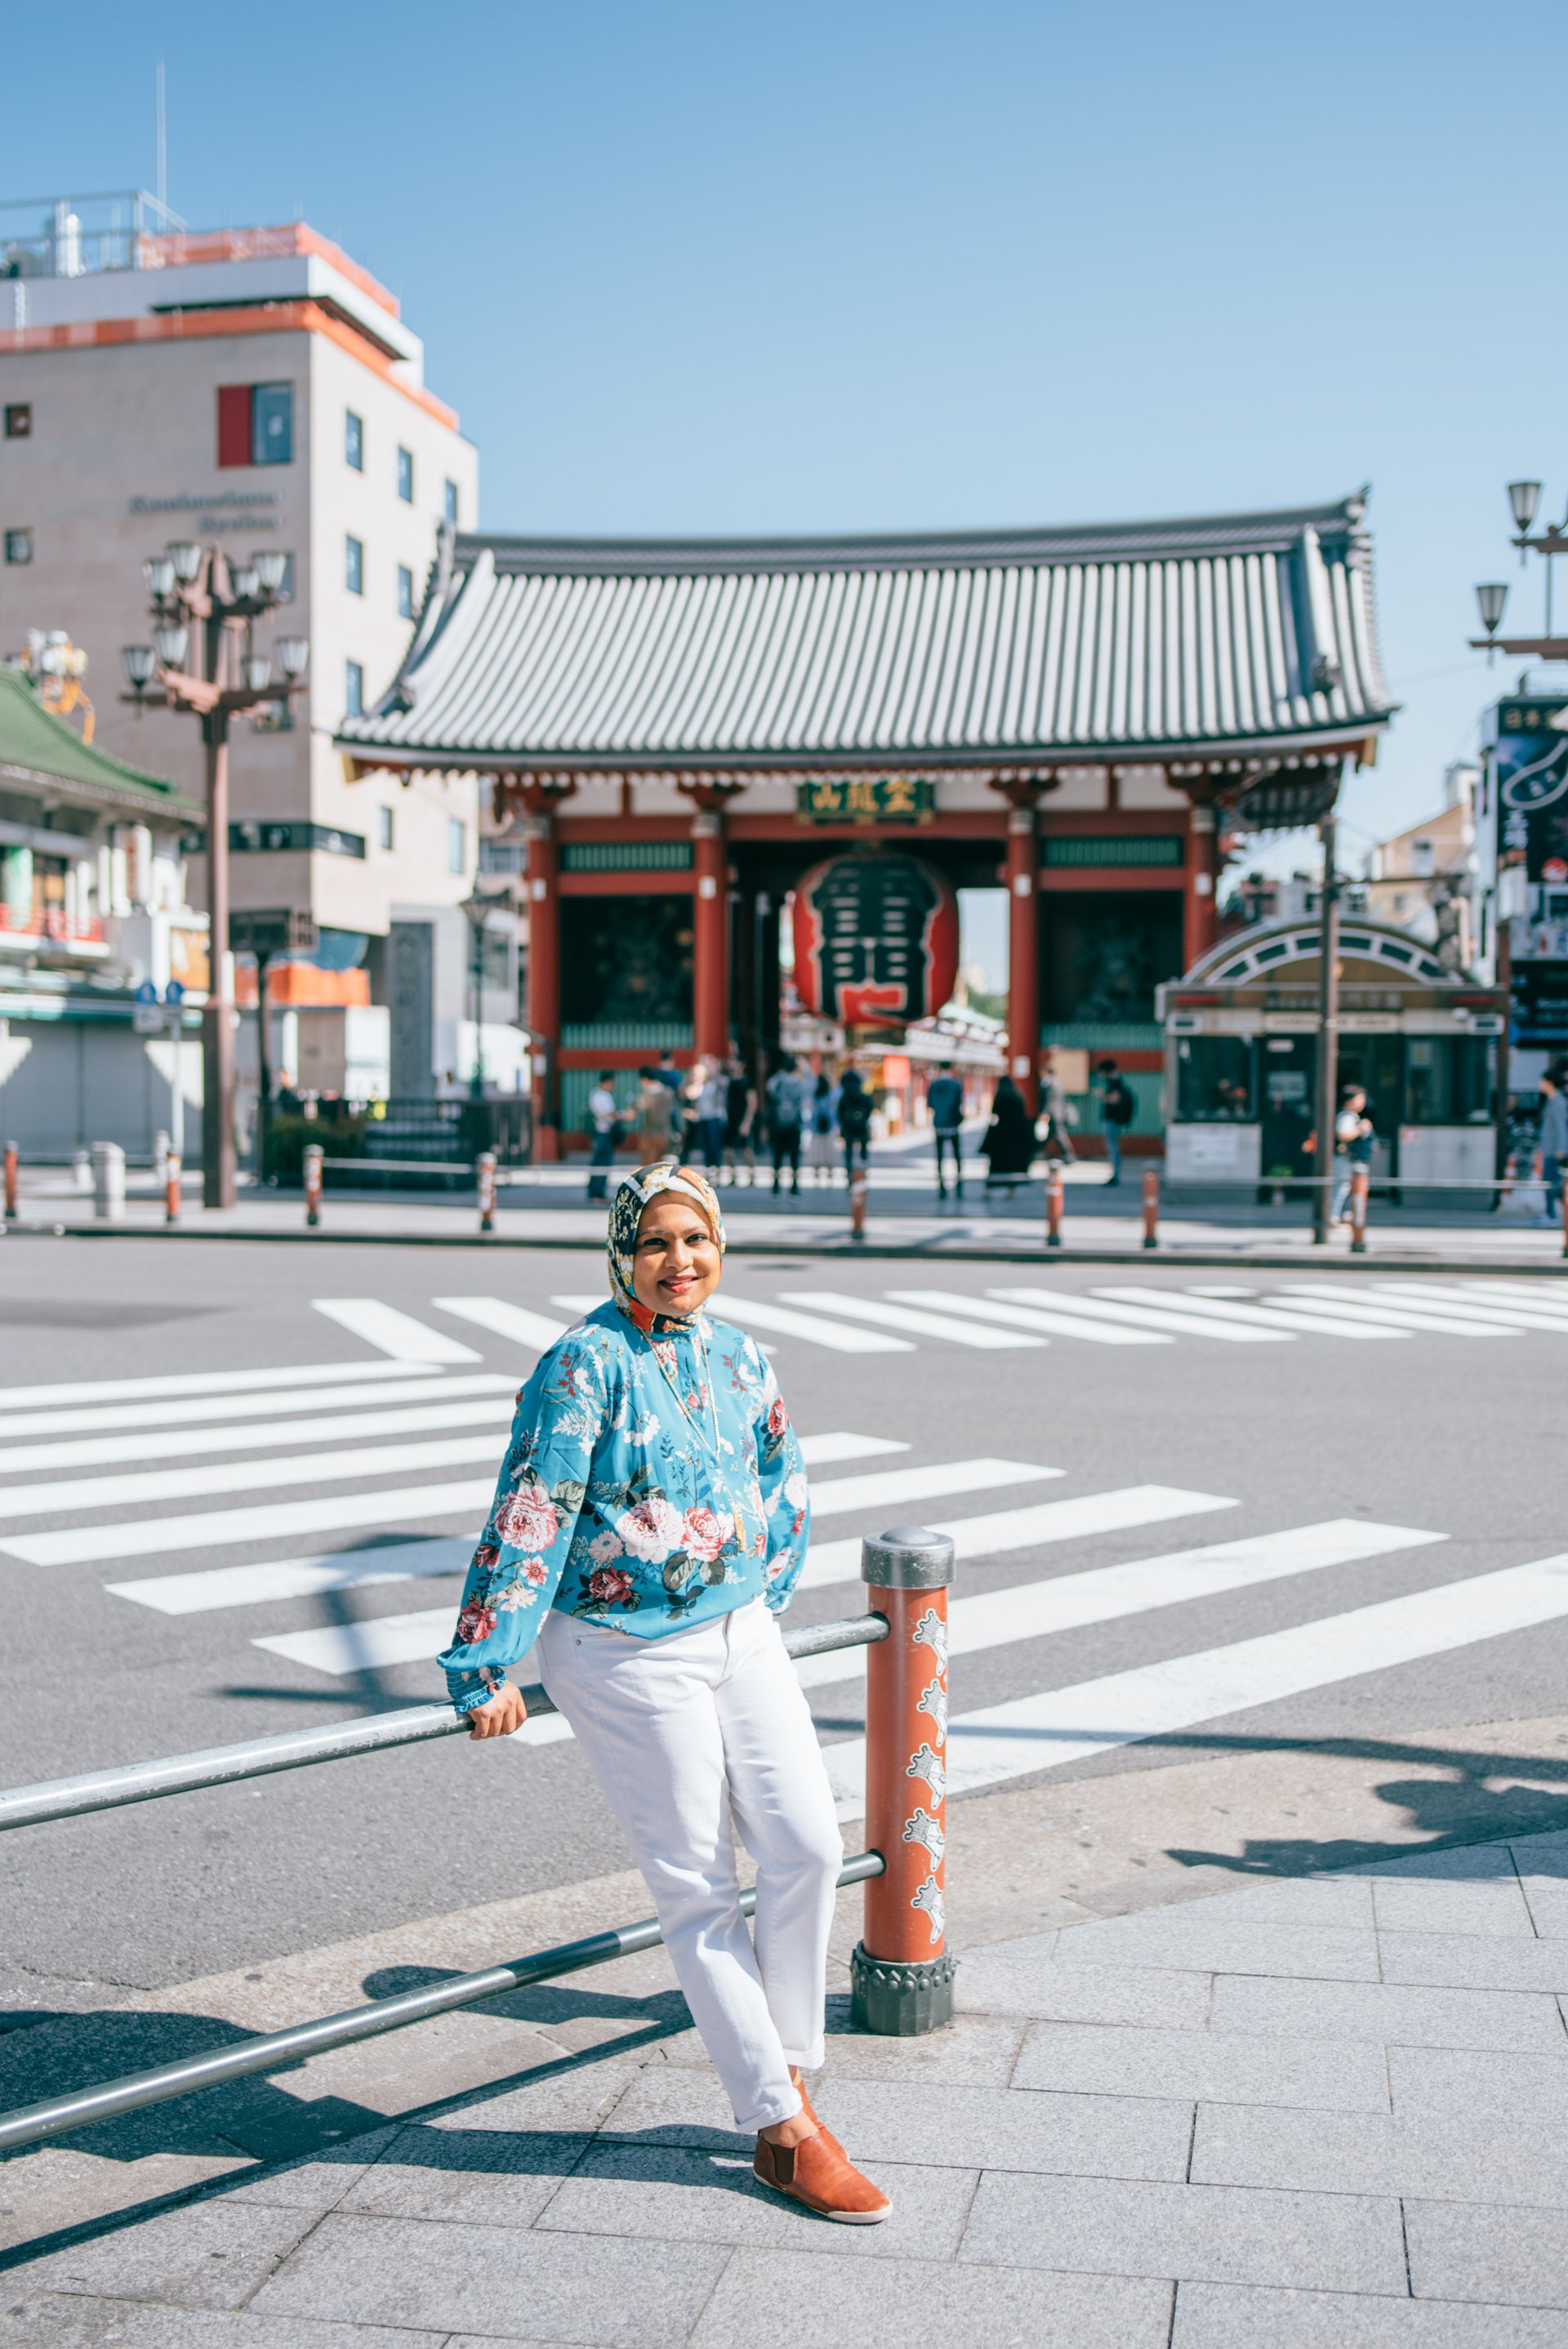 Tokyo-Japan-travel-story-Flytographer-20